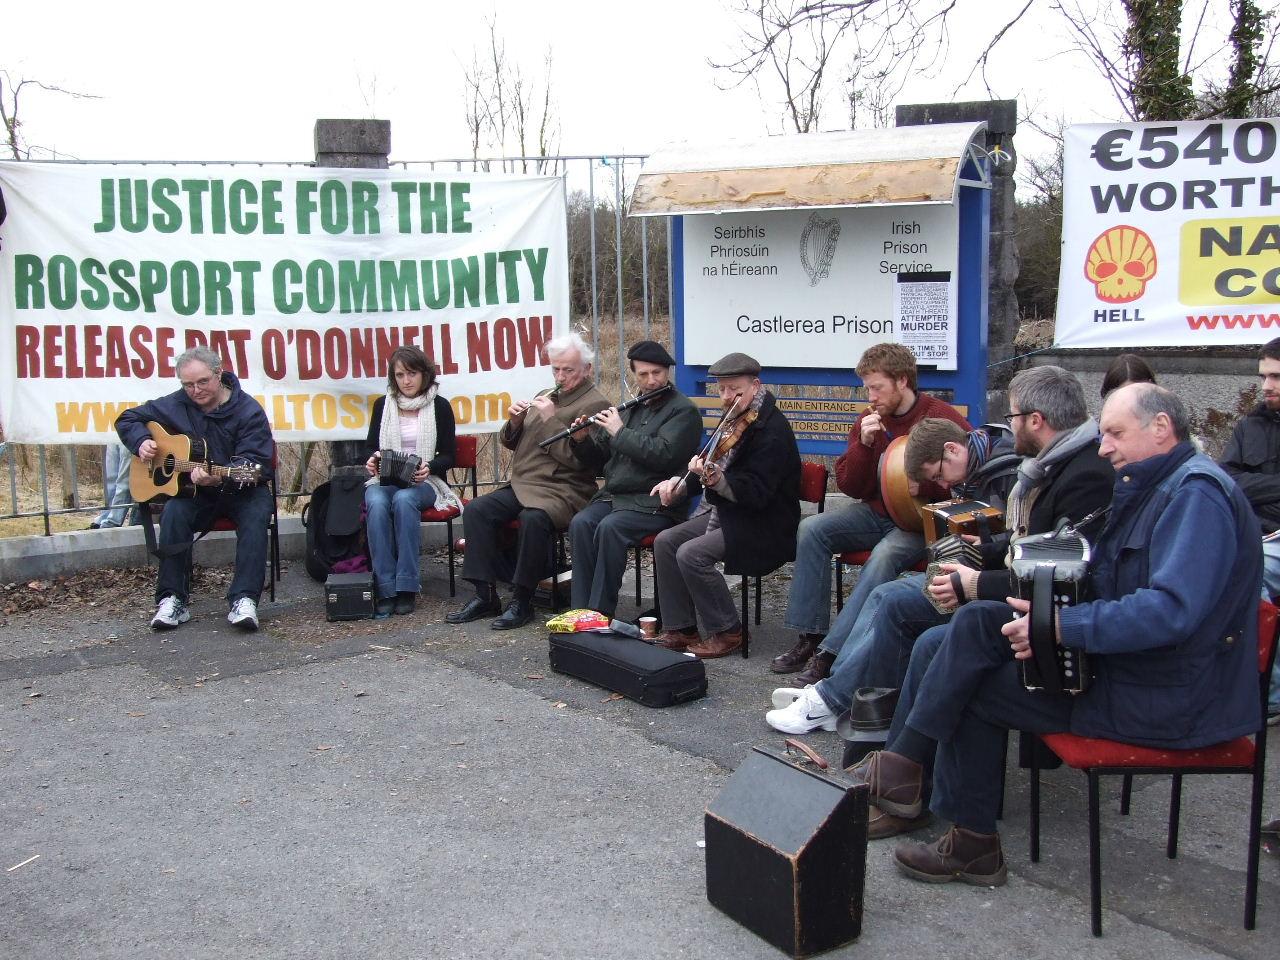 Music at Castlerea Prison